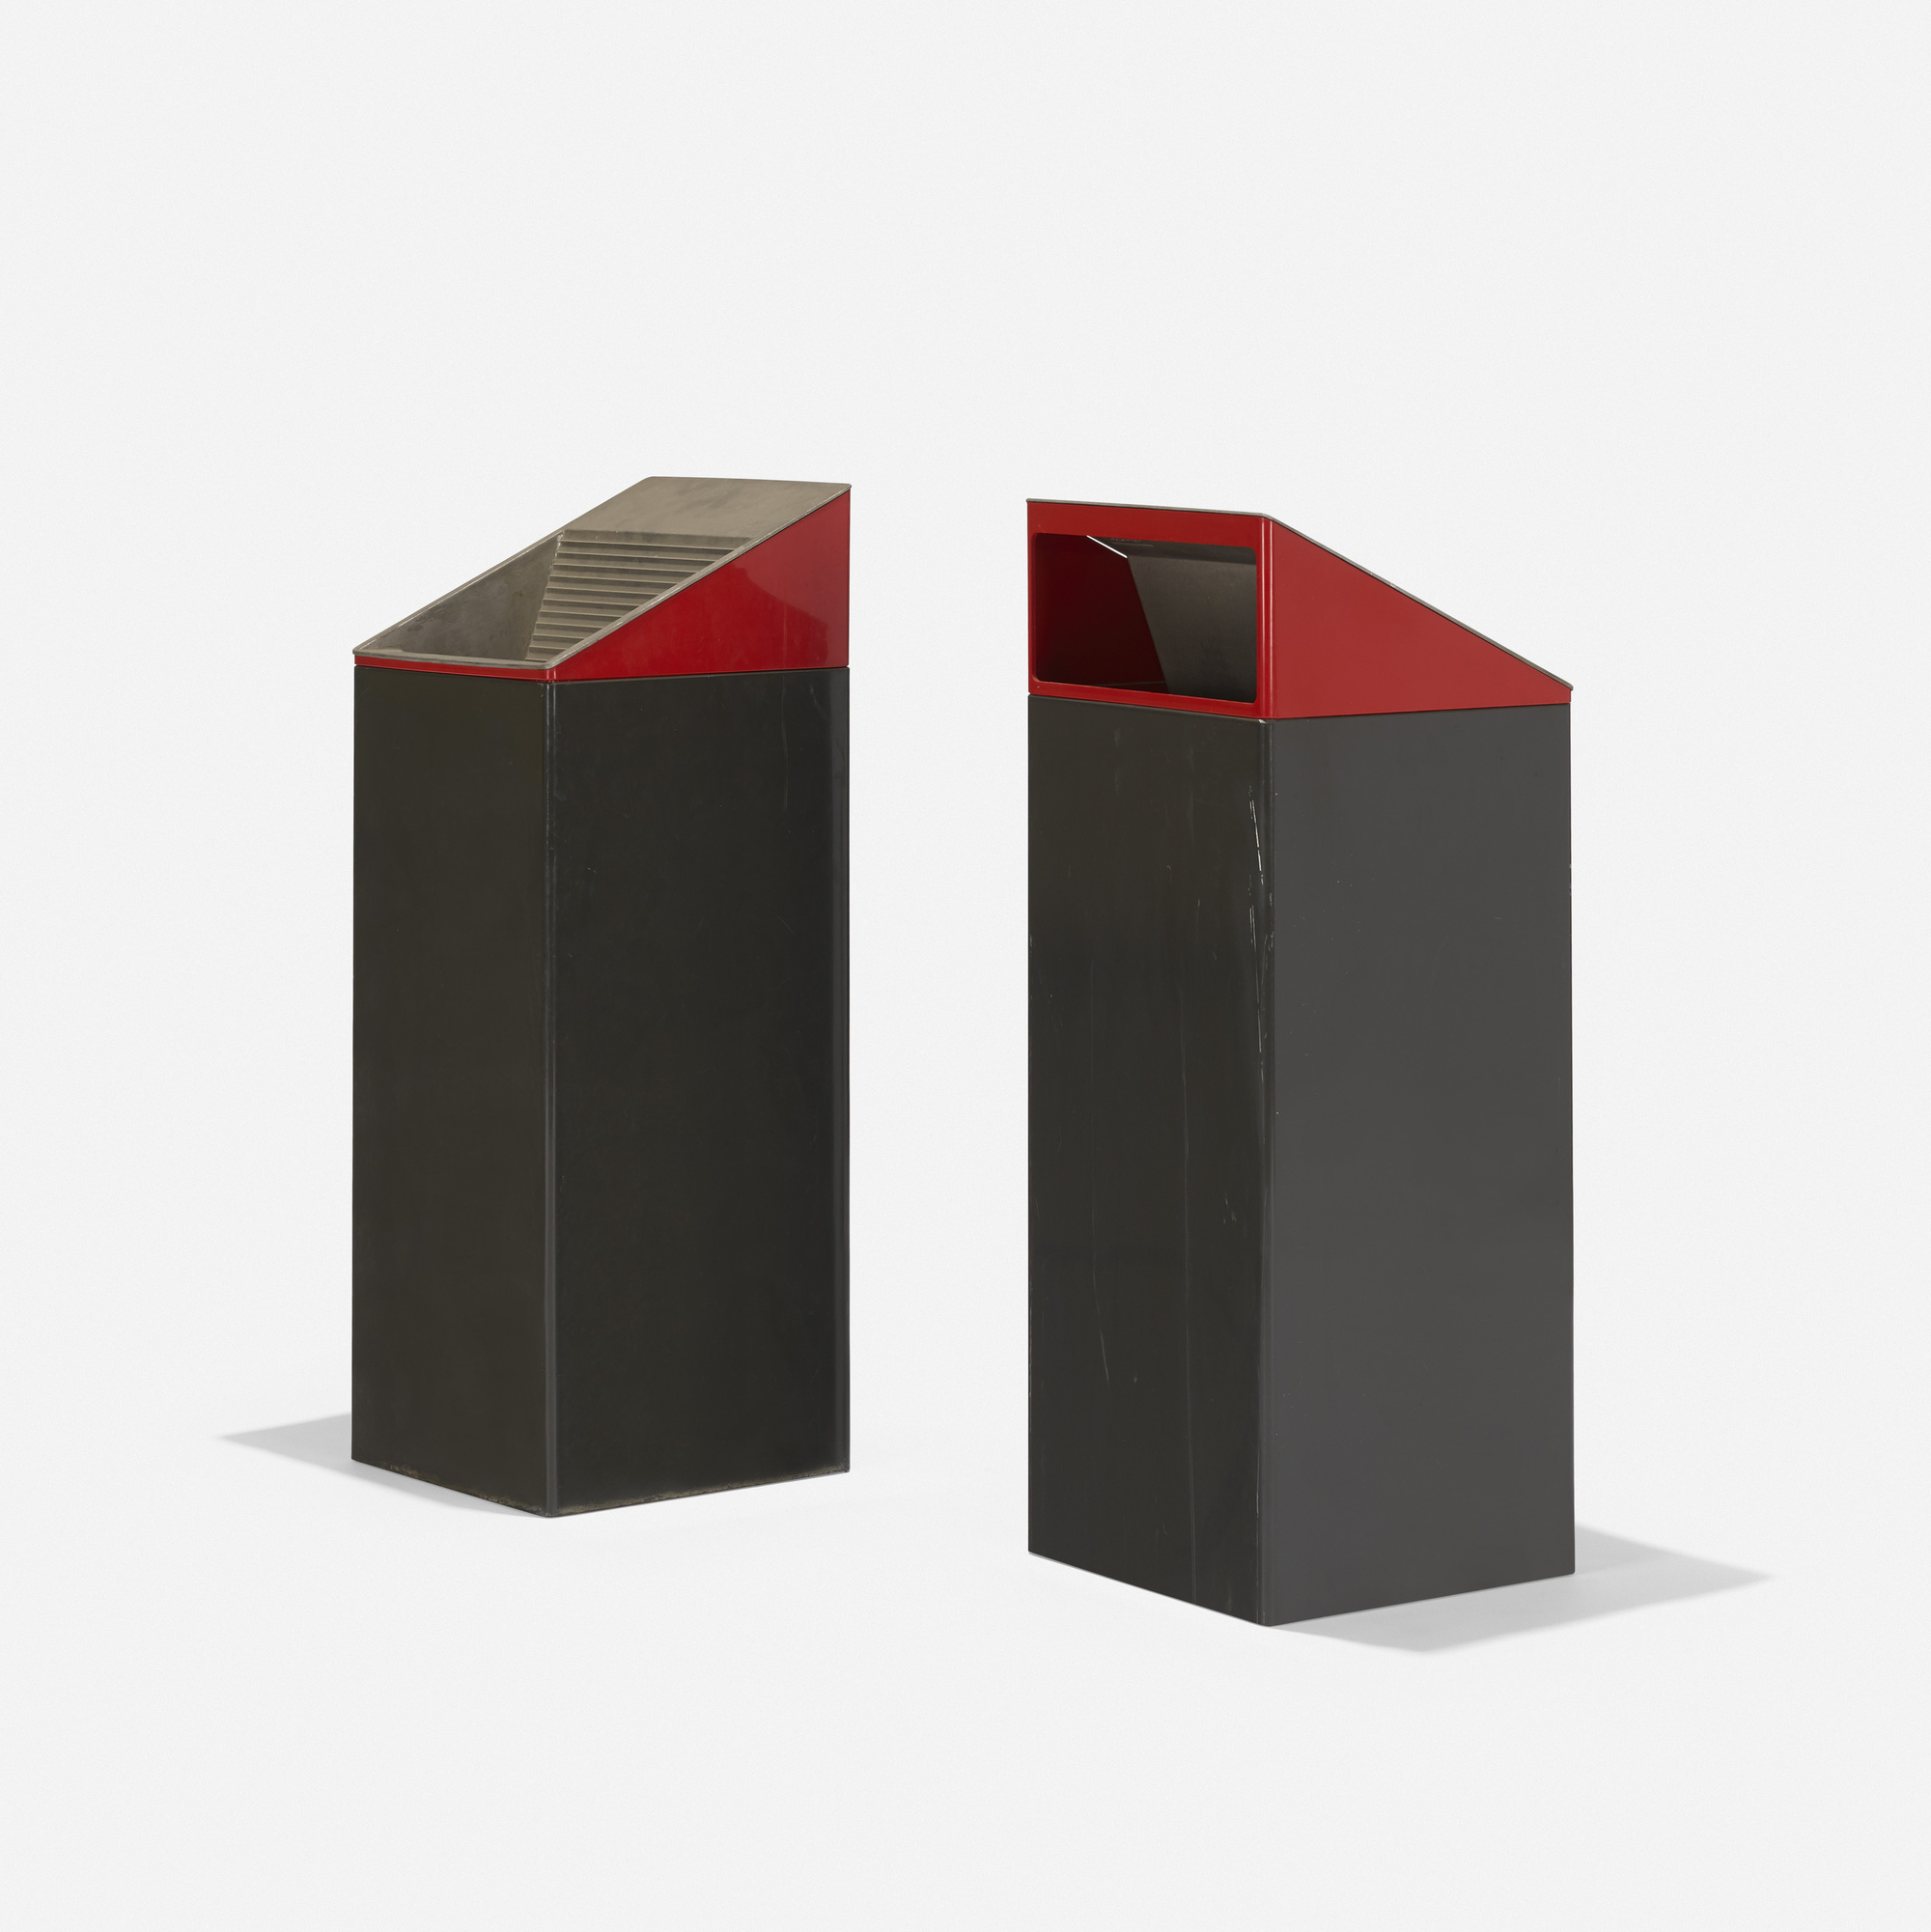 299: Kartell / wastebaskets, pair (1 of 3)